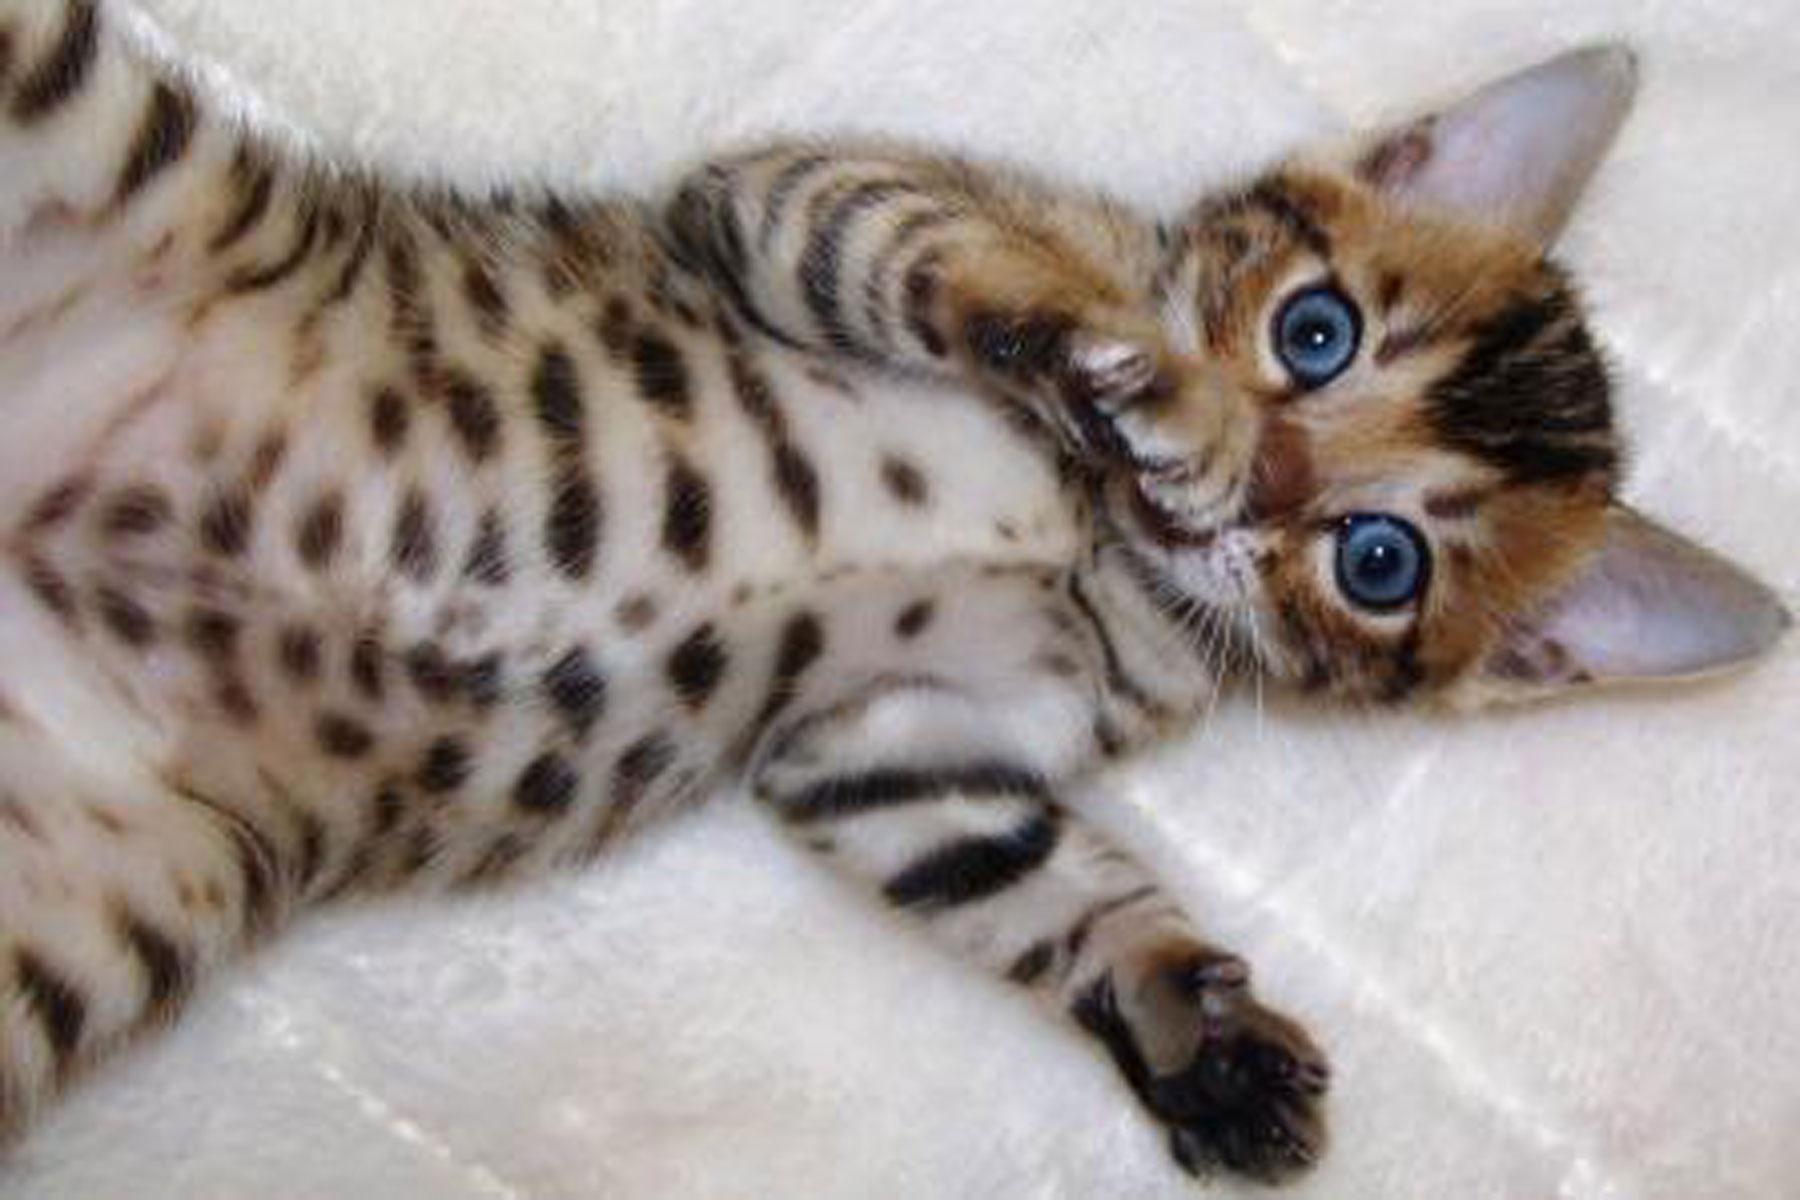 bengal kittens - Cute Kittens Photo (41543887) - Fanpop